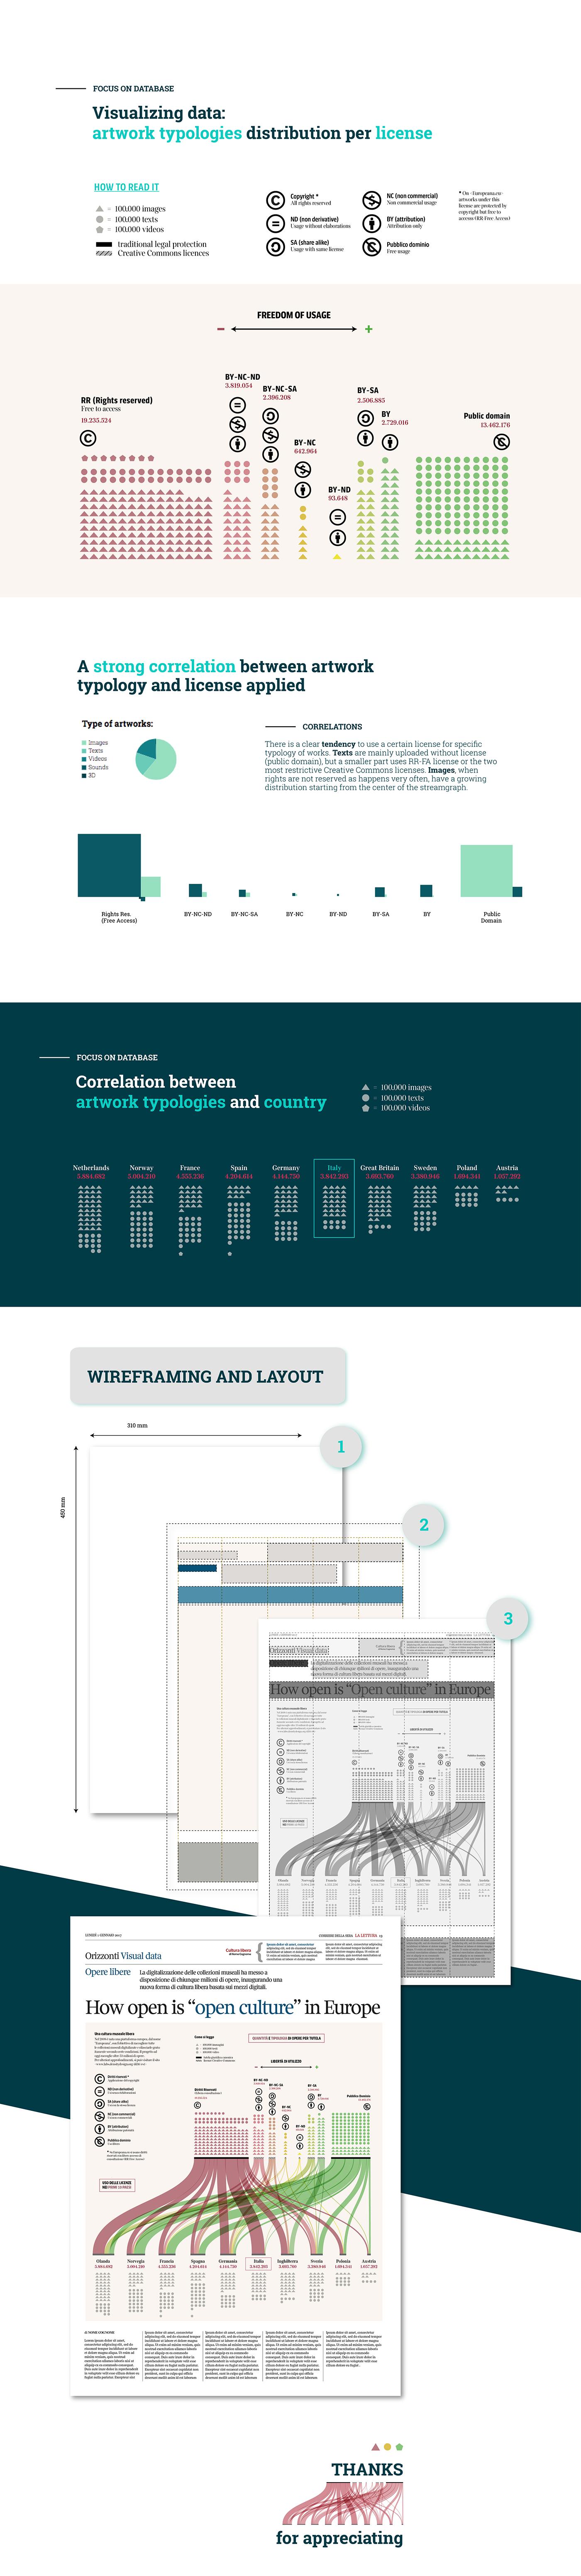 infographic dataviz data visualization ludovico pincini creative commons Data